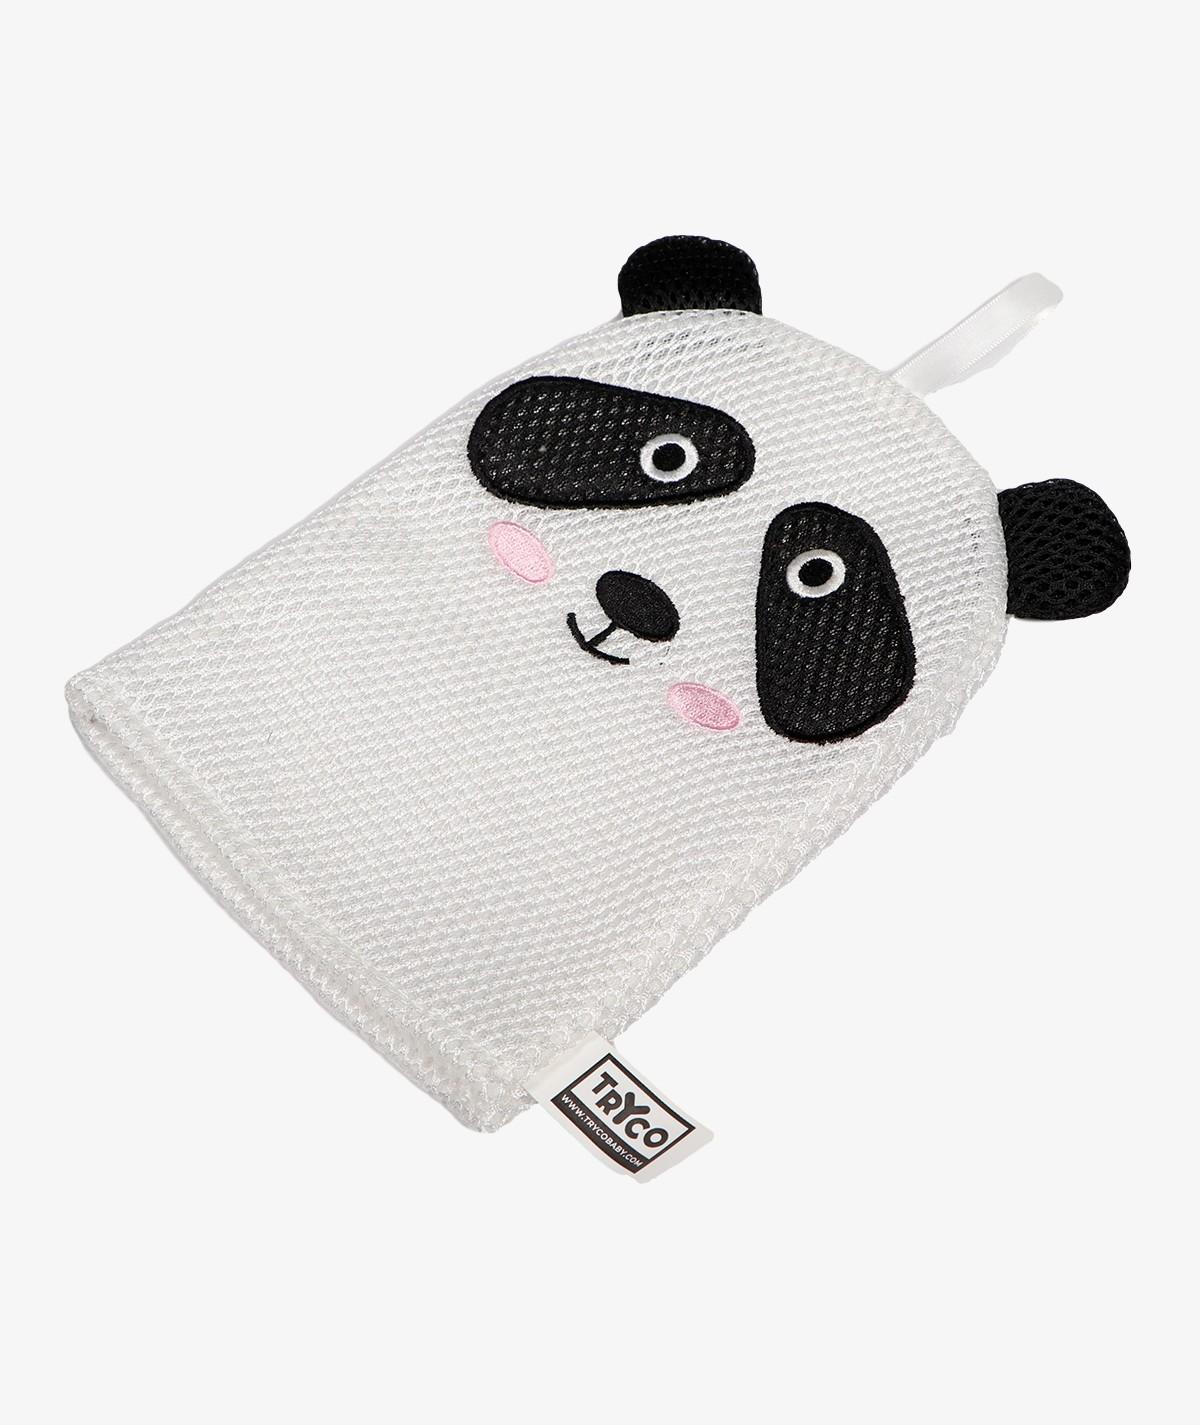 Panda Pippa Washcloth